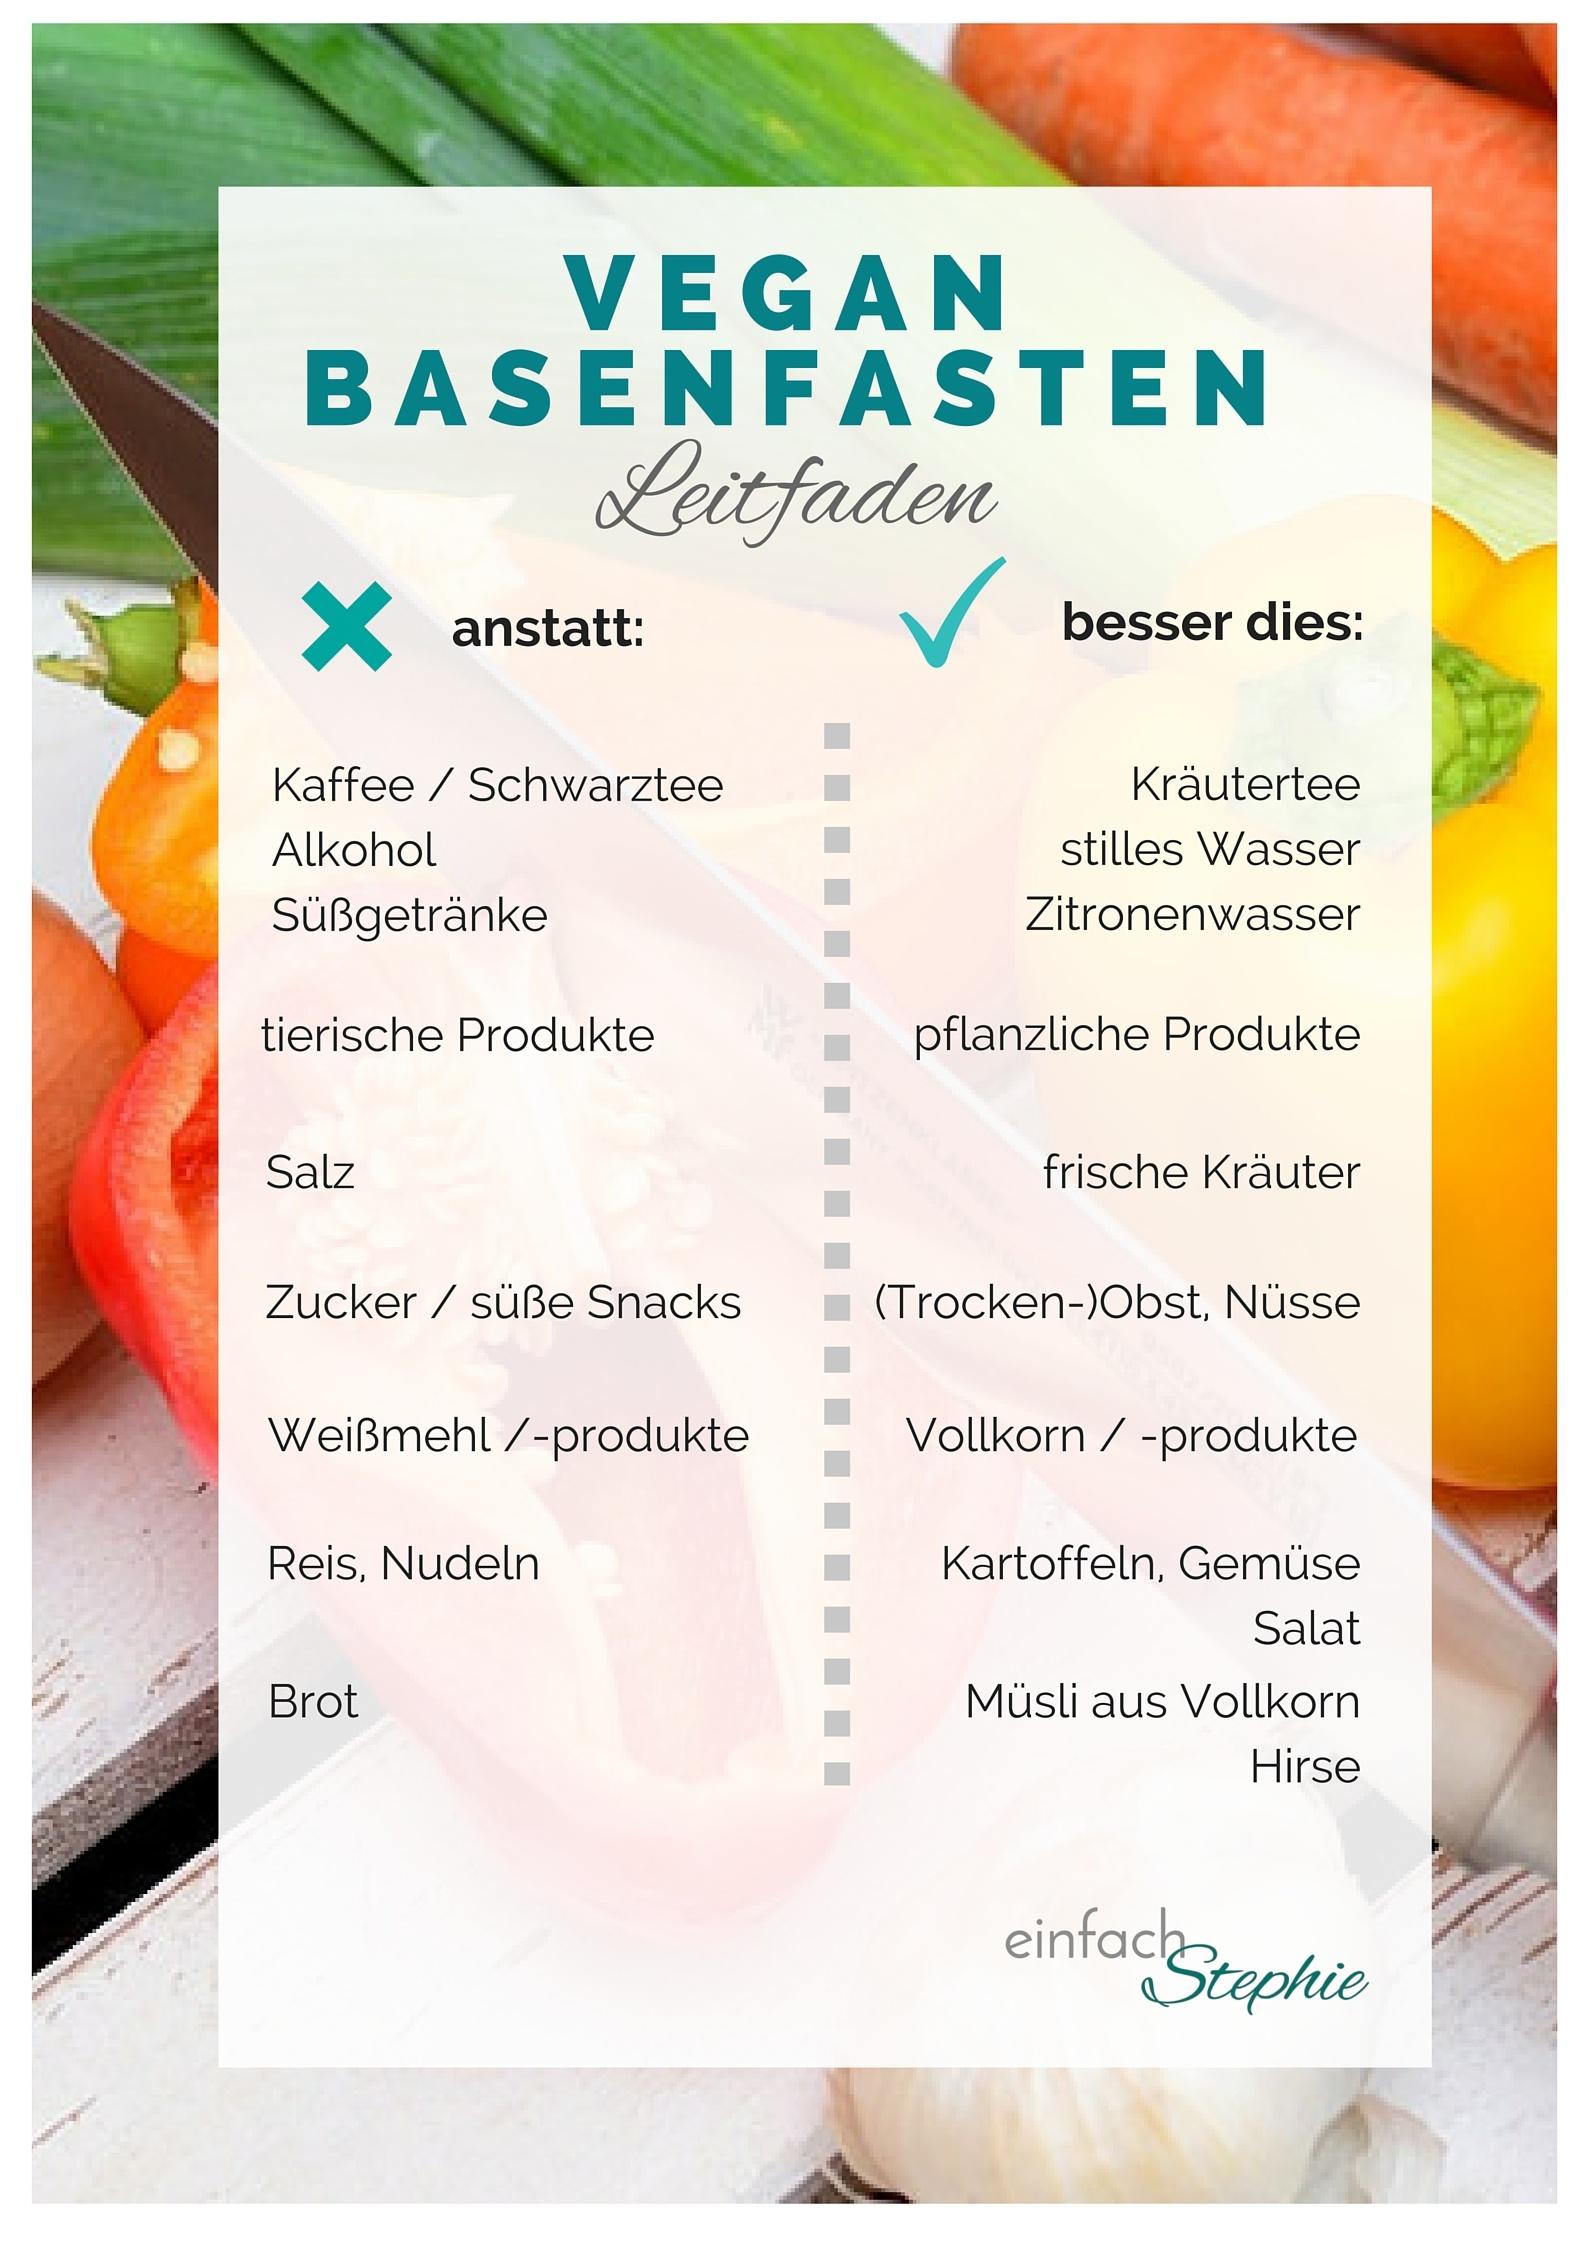 vegan Basenfasten Leitfaden zum Gratis Download